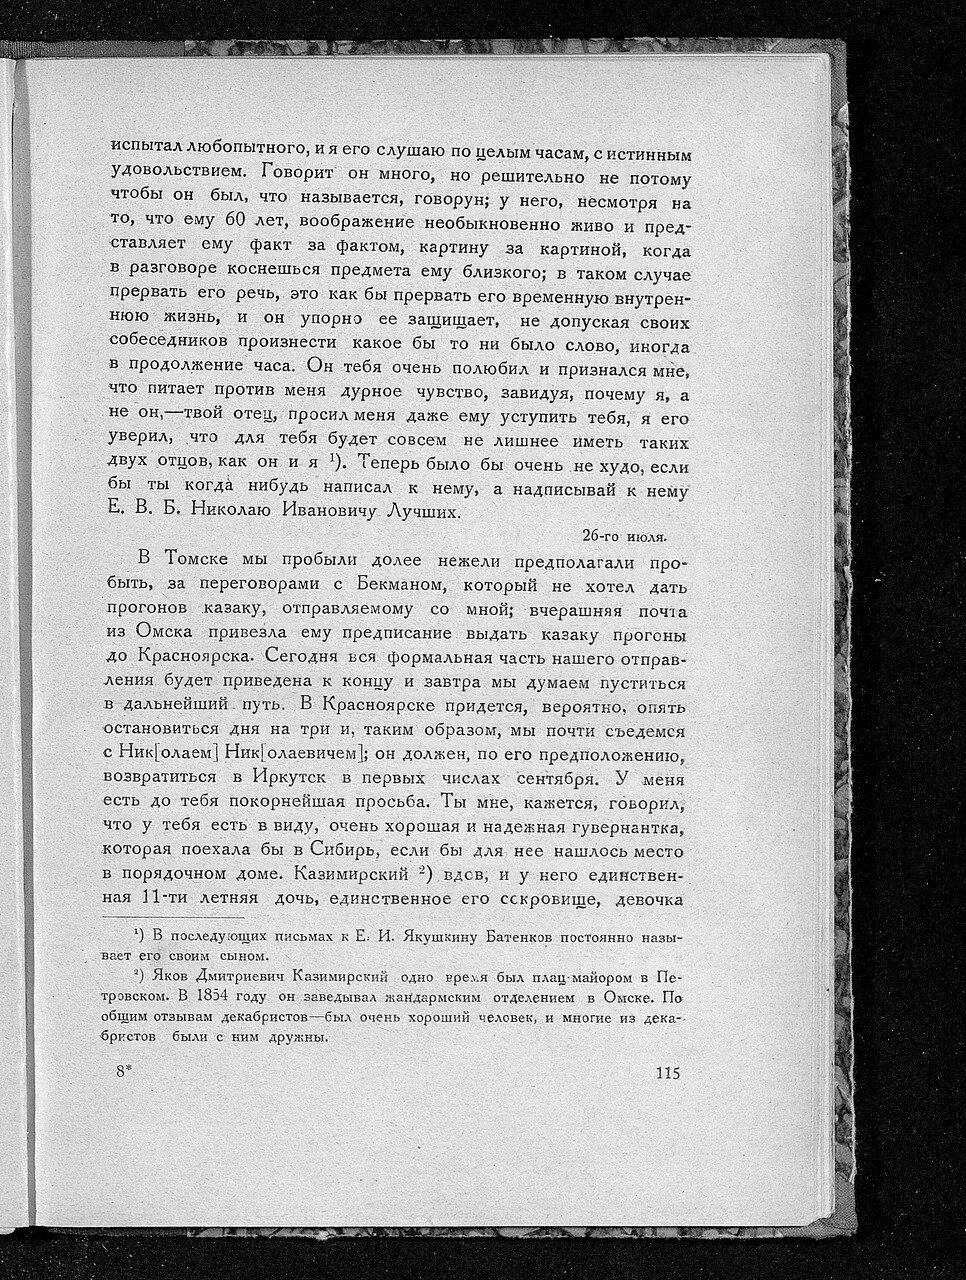 https://img-fotki.yandex.ru/get/962386/199368979.a2/0_21436e_ff74c696_XXXL.jpg